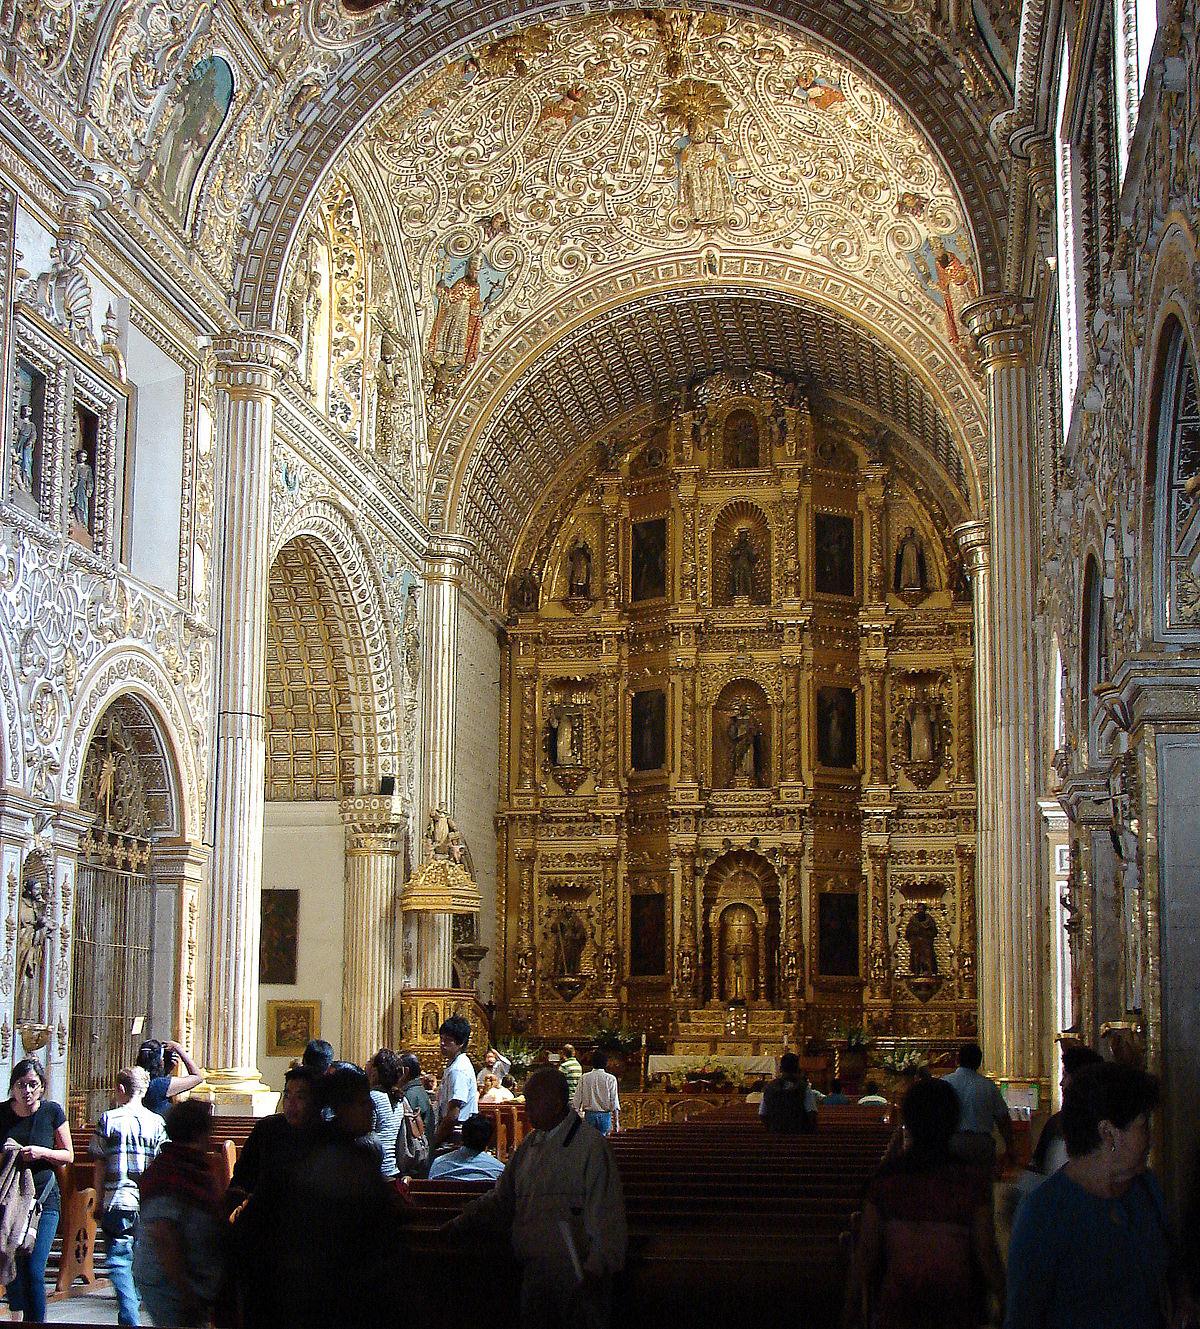 Arquitectura barroca en hispanoam rica wikipedia la for Arquitectura wikipedia